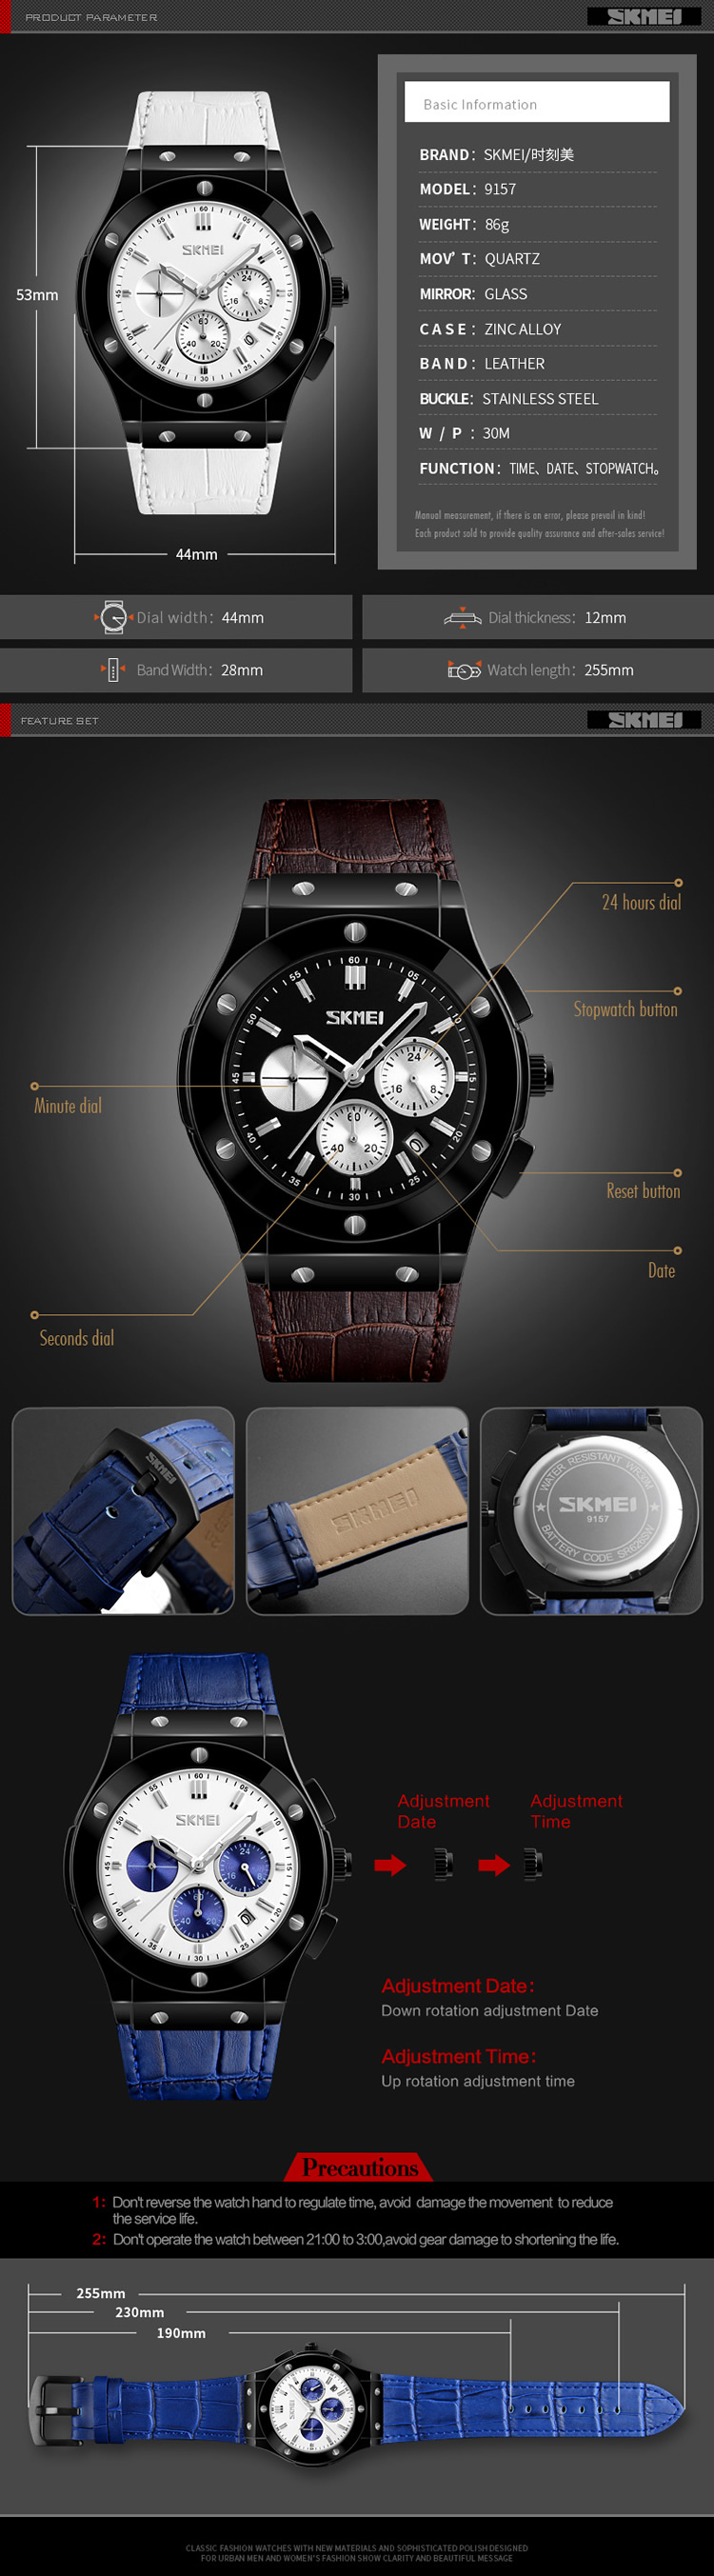 2017 Skmei 9157 мужчины кварцевые часы Мода Дизайн качество Натуральная кожа relogio masculino